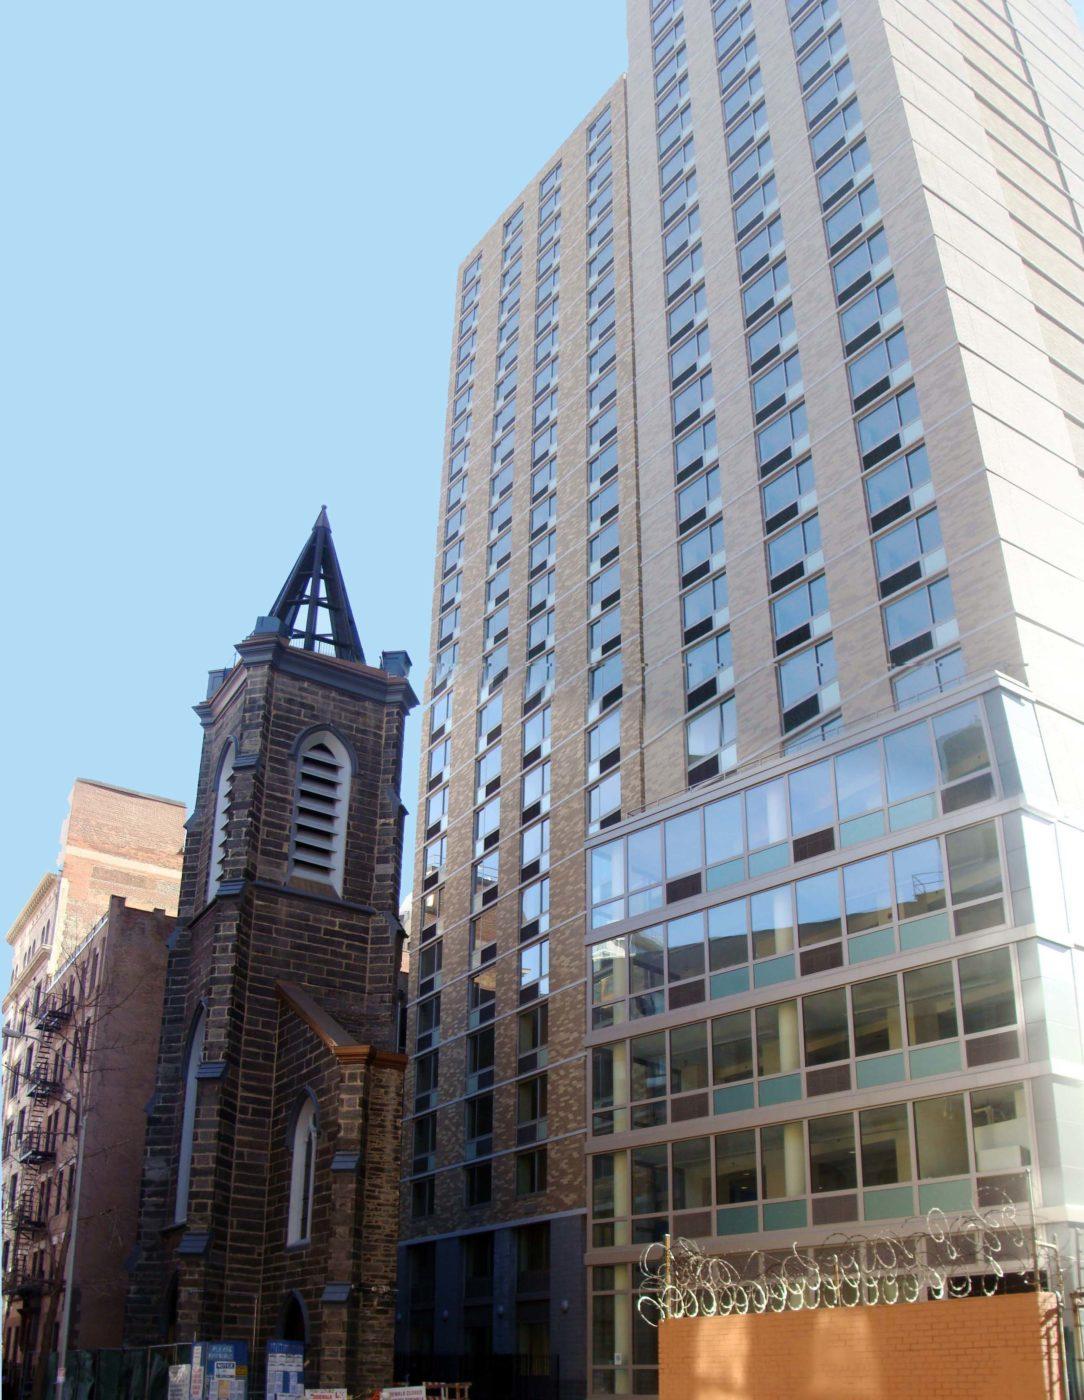 Facade of St. Ann's Church with NYU dorm behind it